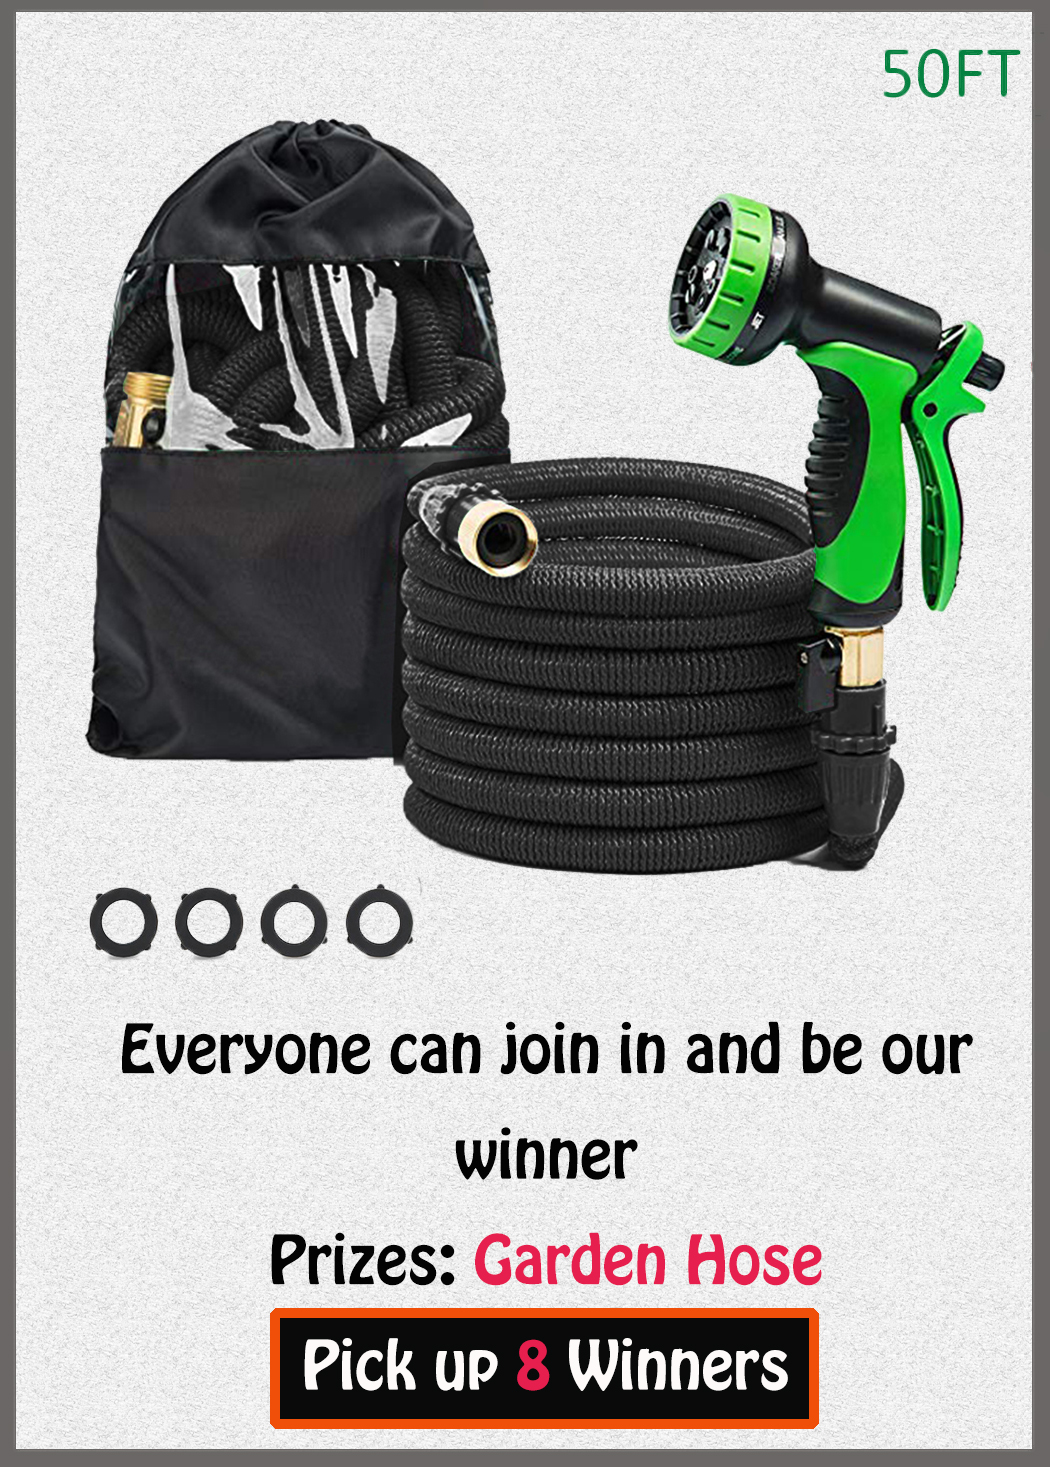 Garden Hose 50 Feet Giveaway - 8 Winners! Giveaway Image